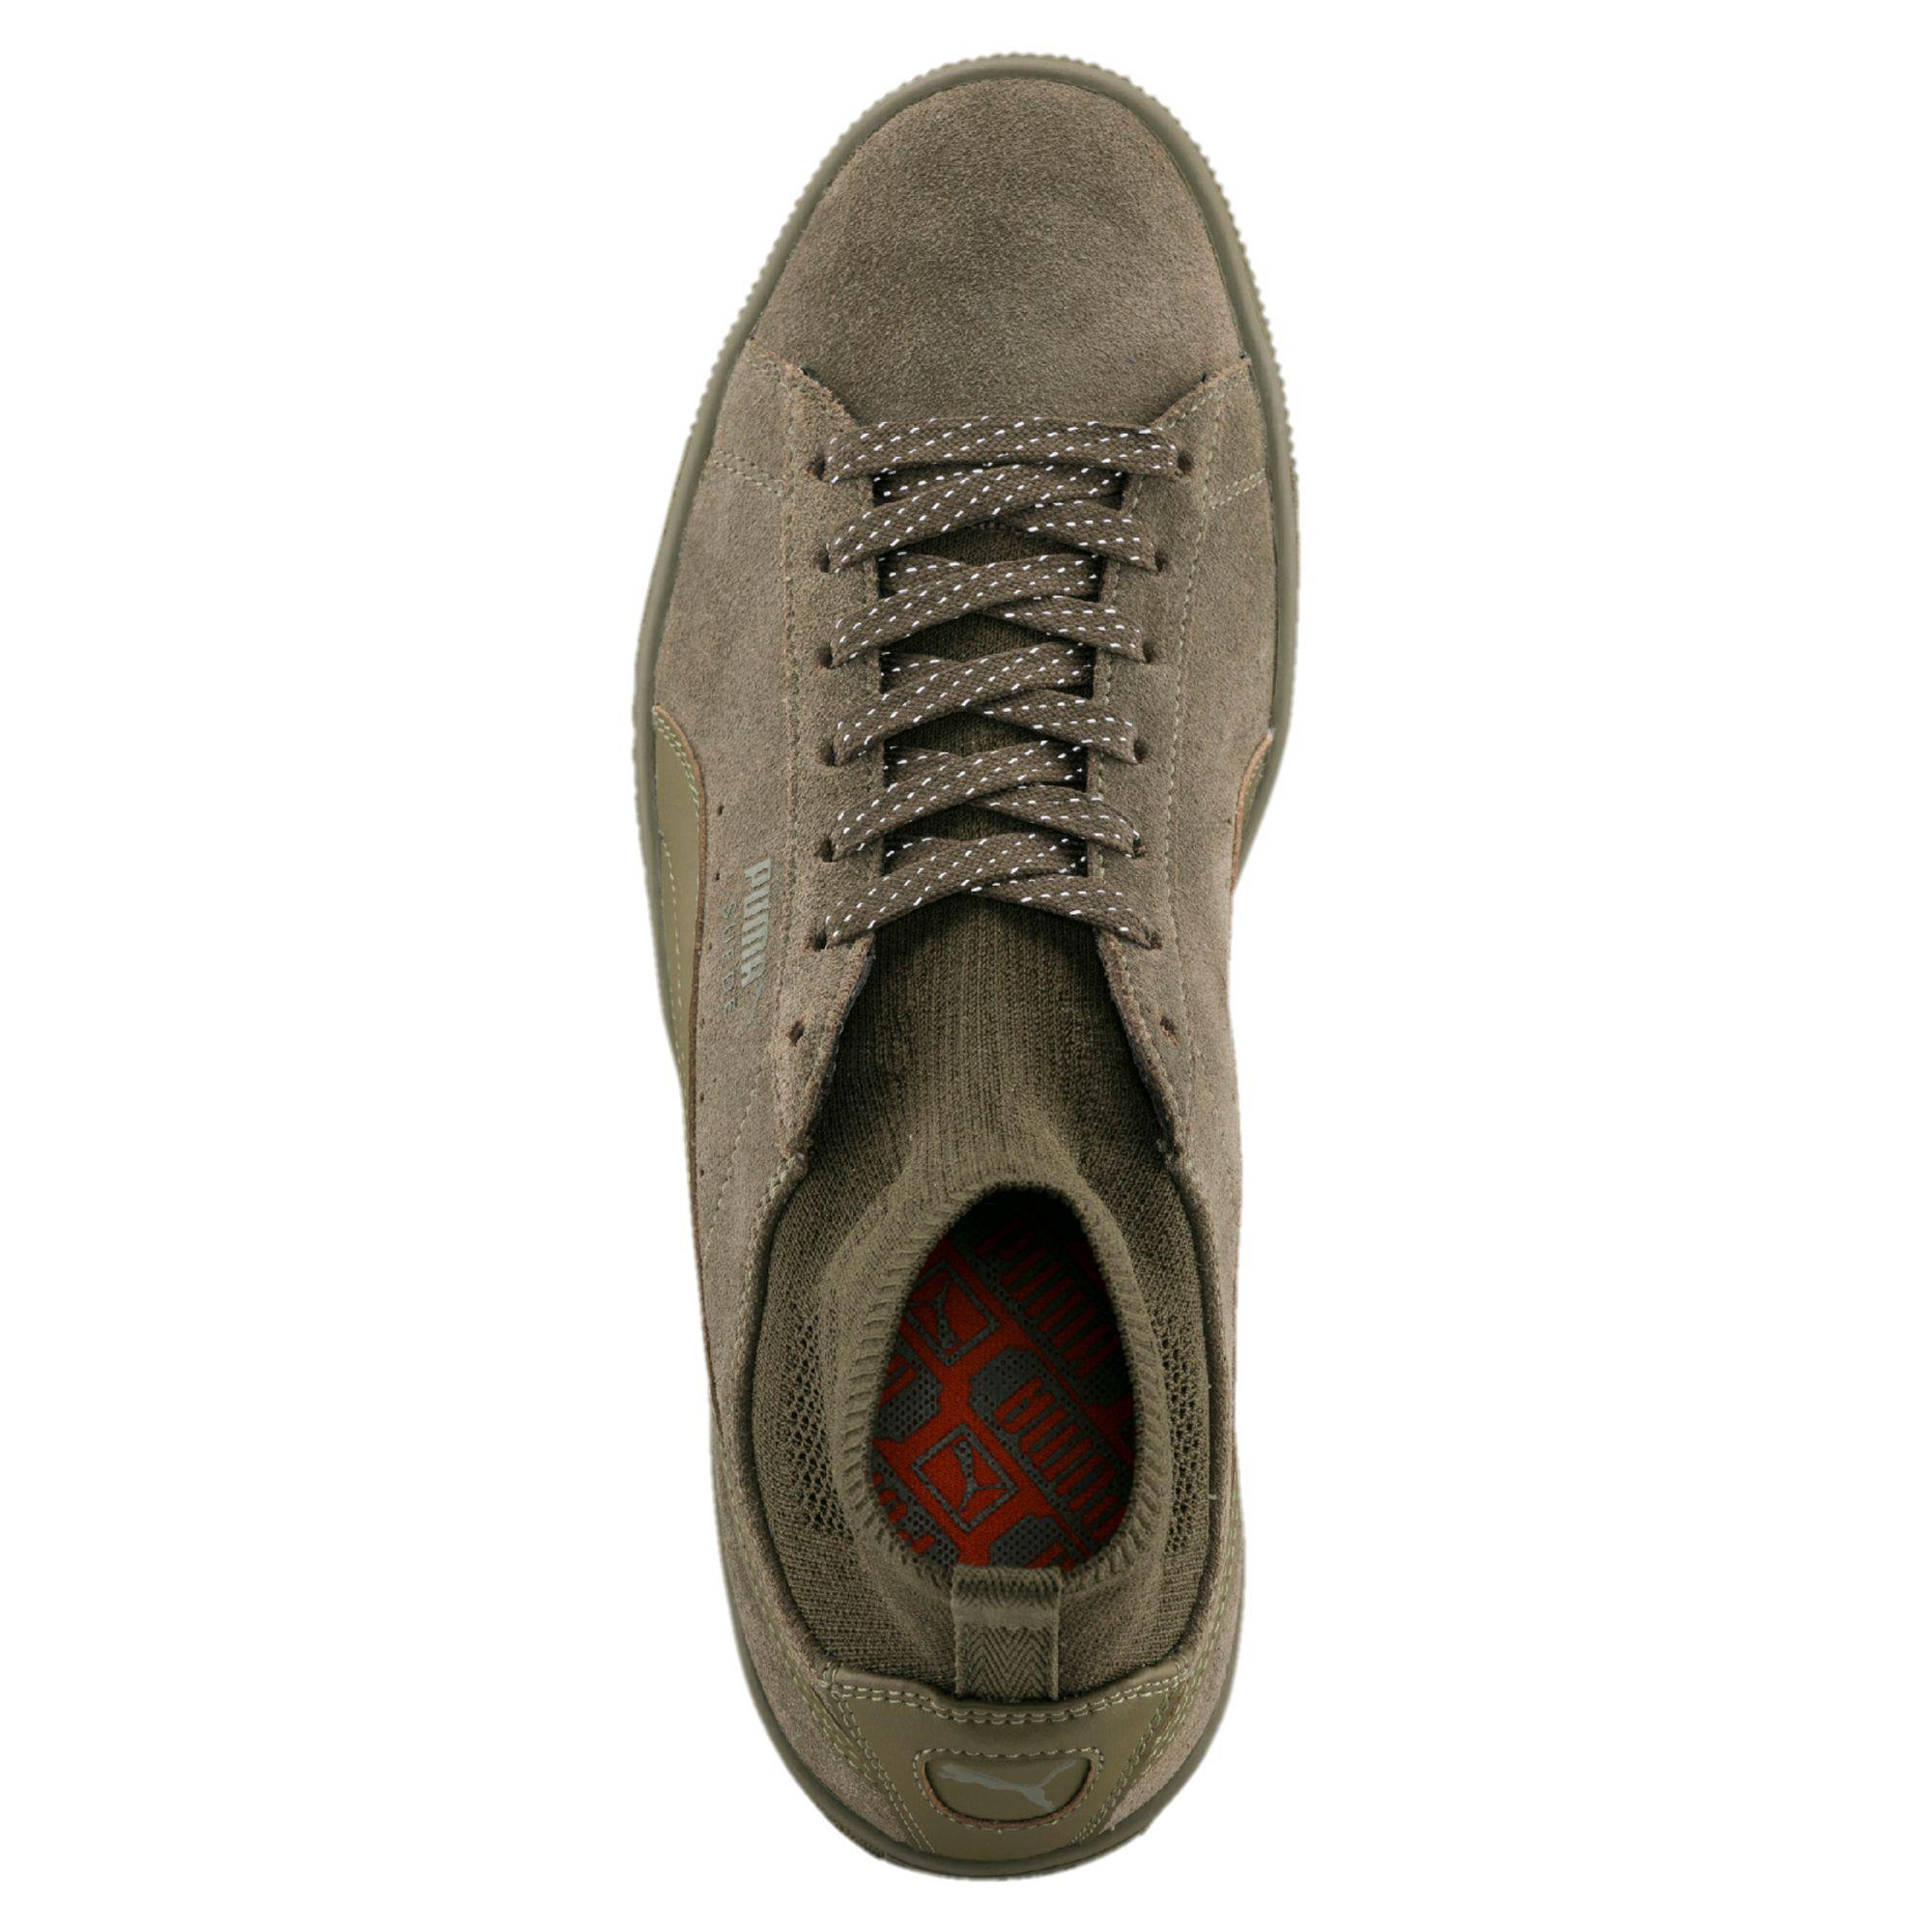 Lyst - PUMA Suede Classic Sock Sneakers in Green for Men c82cf1149